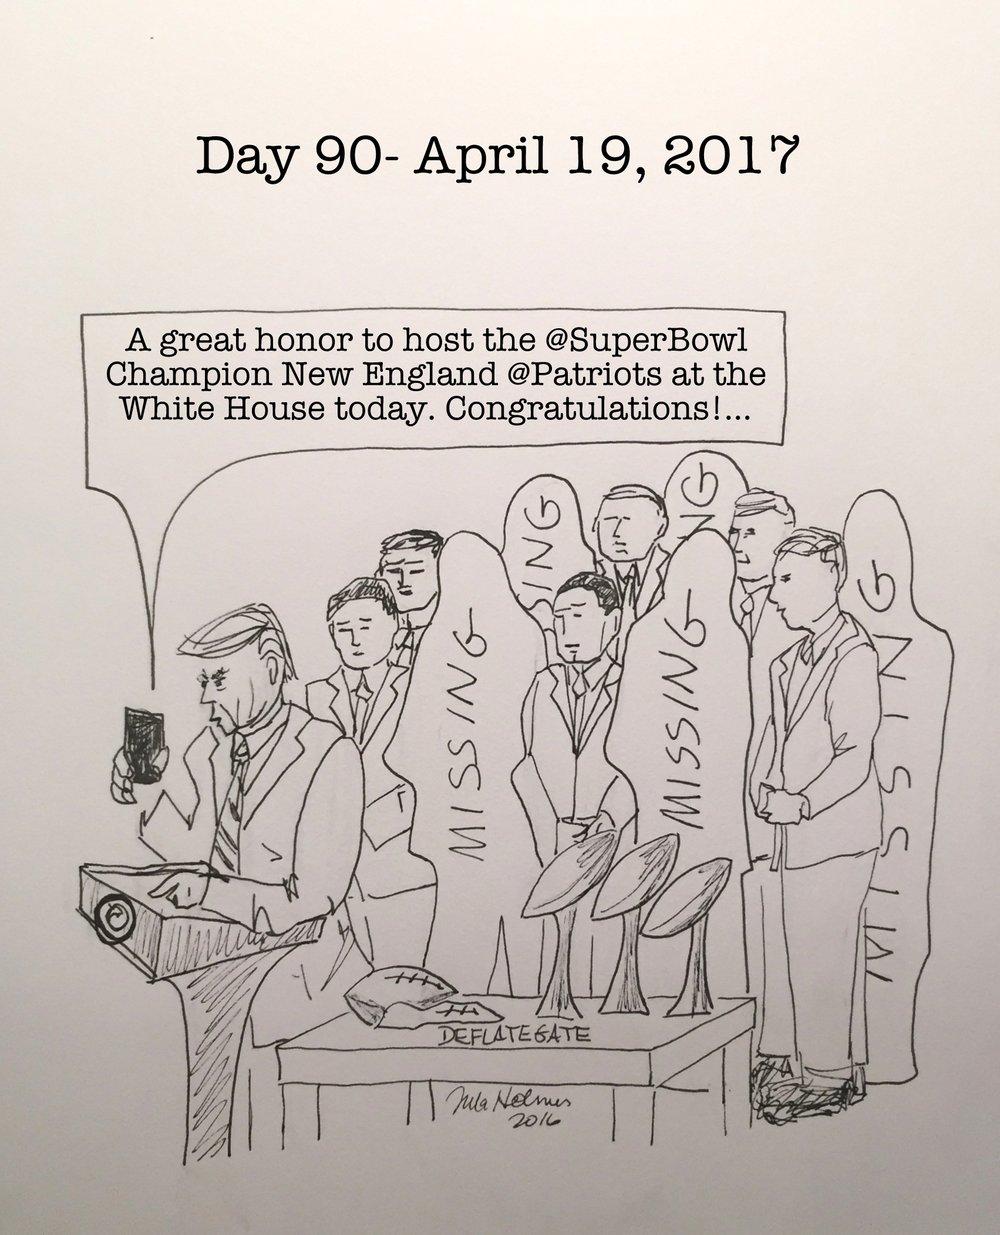 Day 90- April 19, 2017- copyright 2017